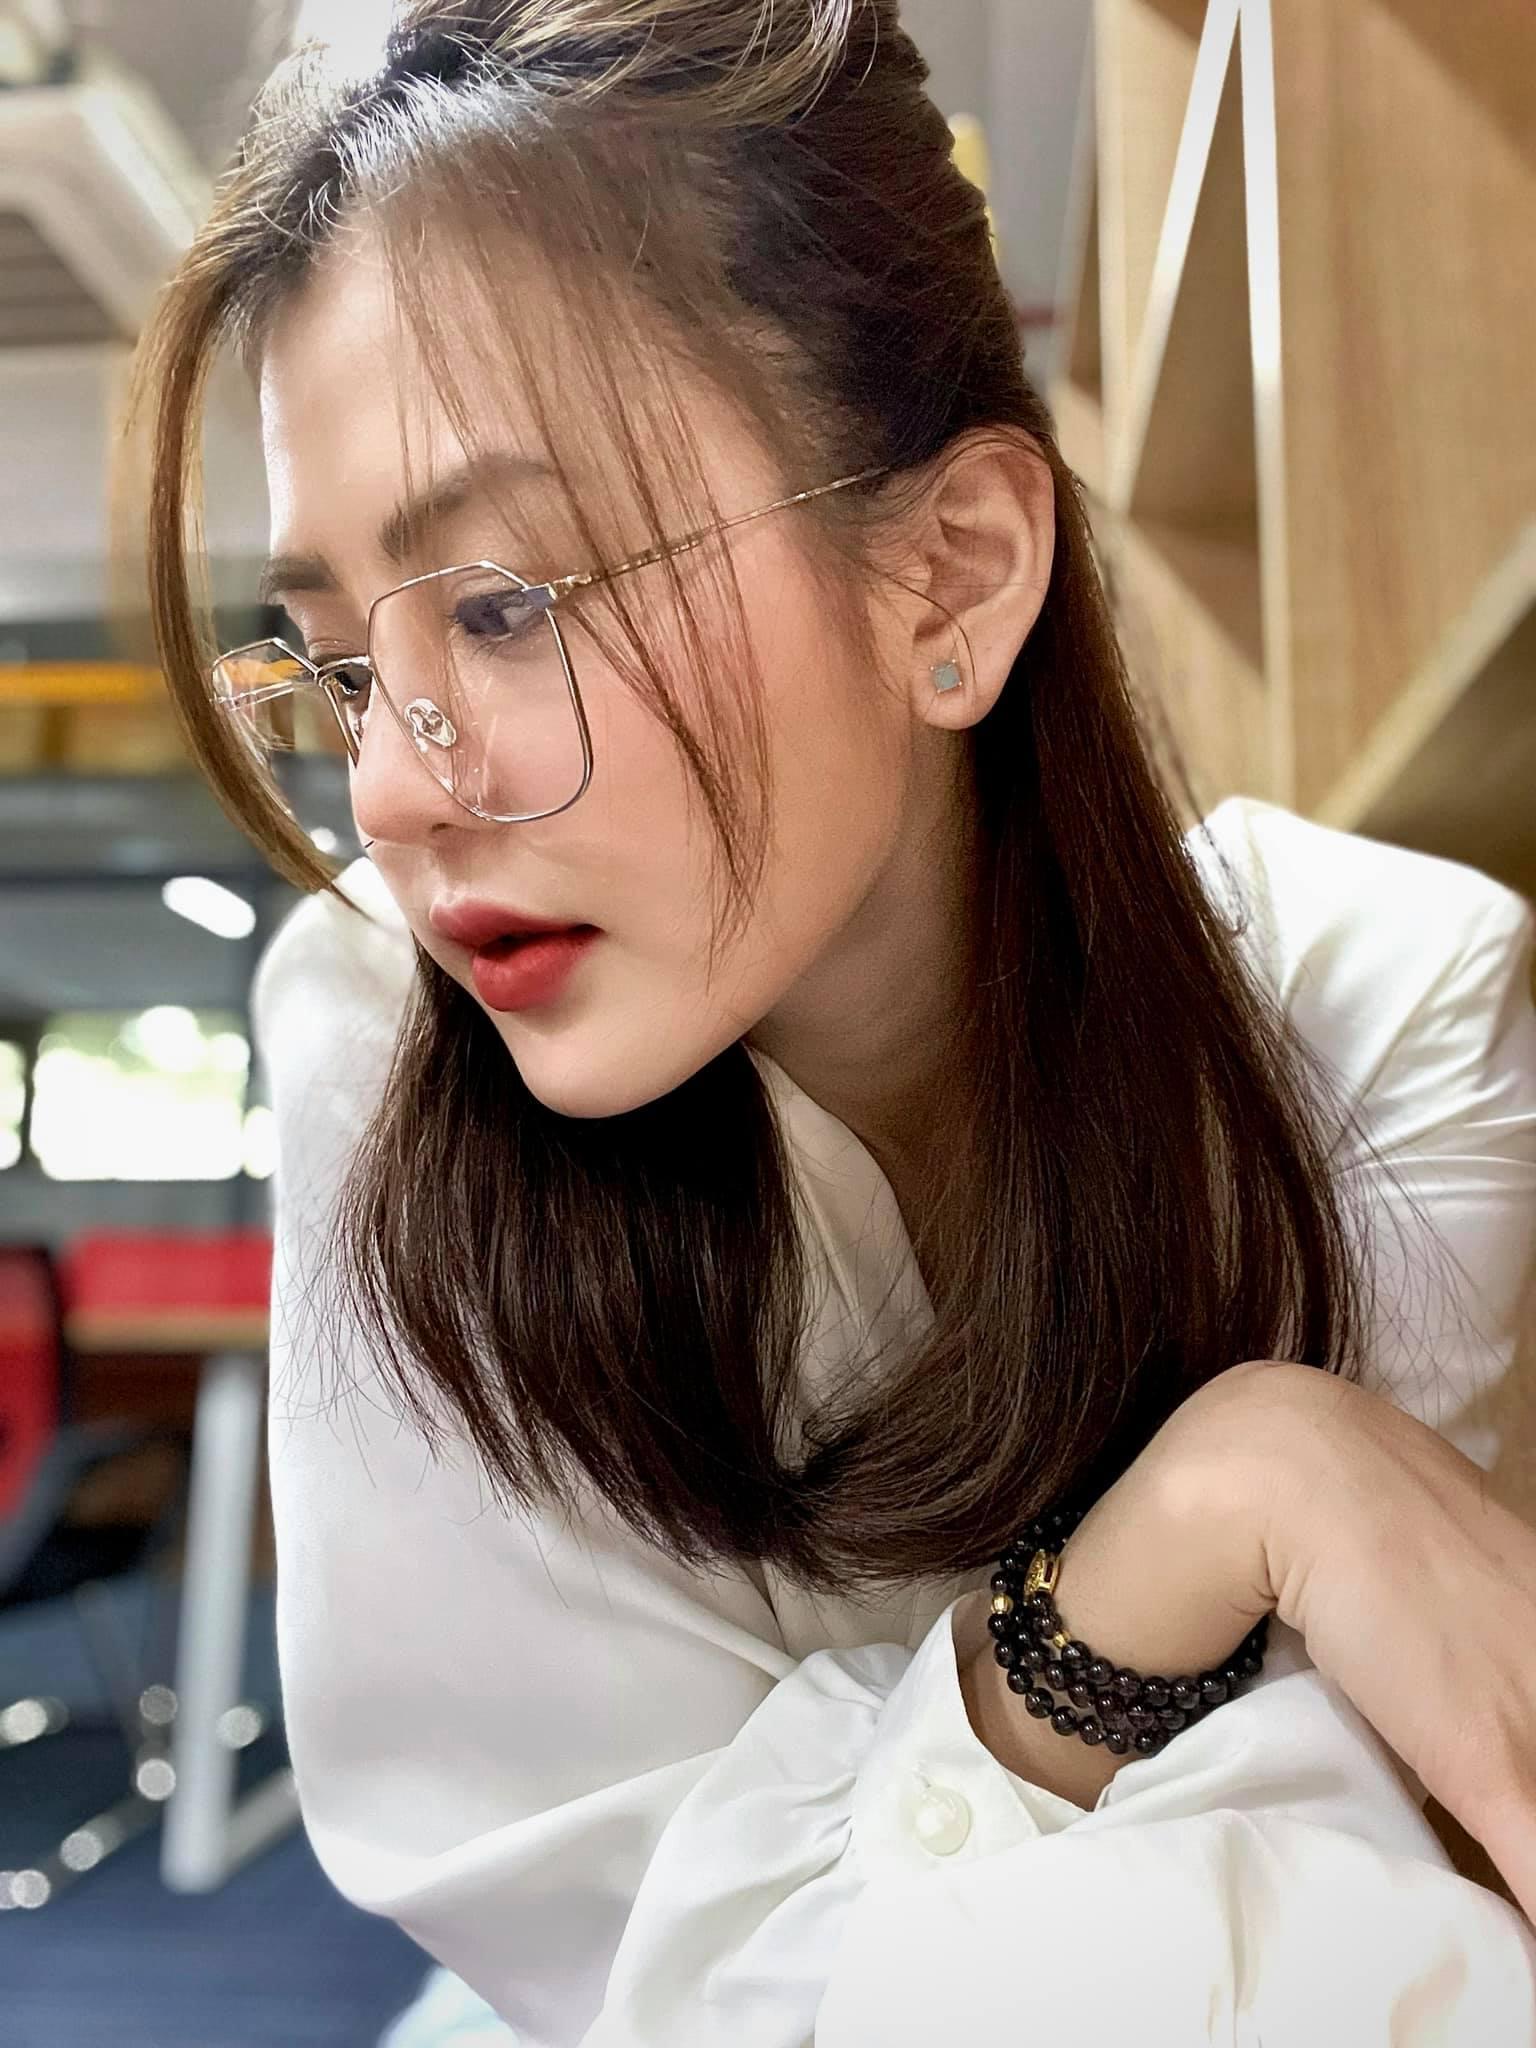 Hotgirl đai đen Taekwondo khoe sắc - Ảnh 7.